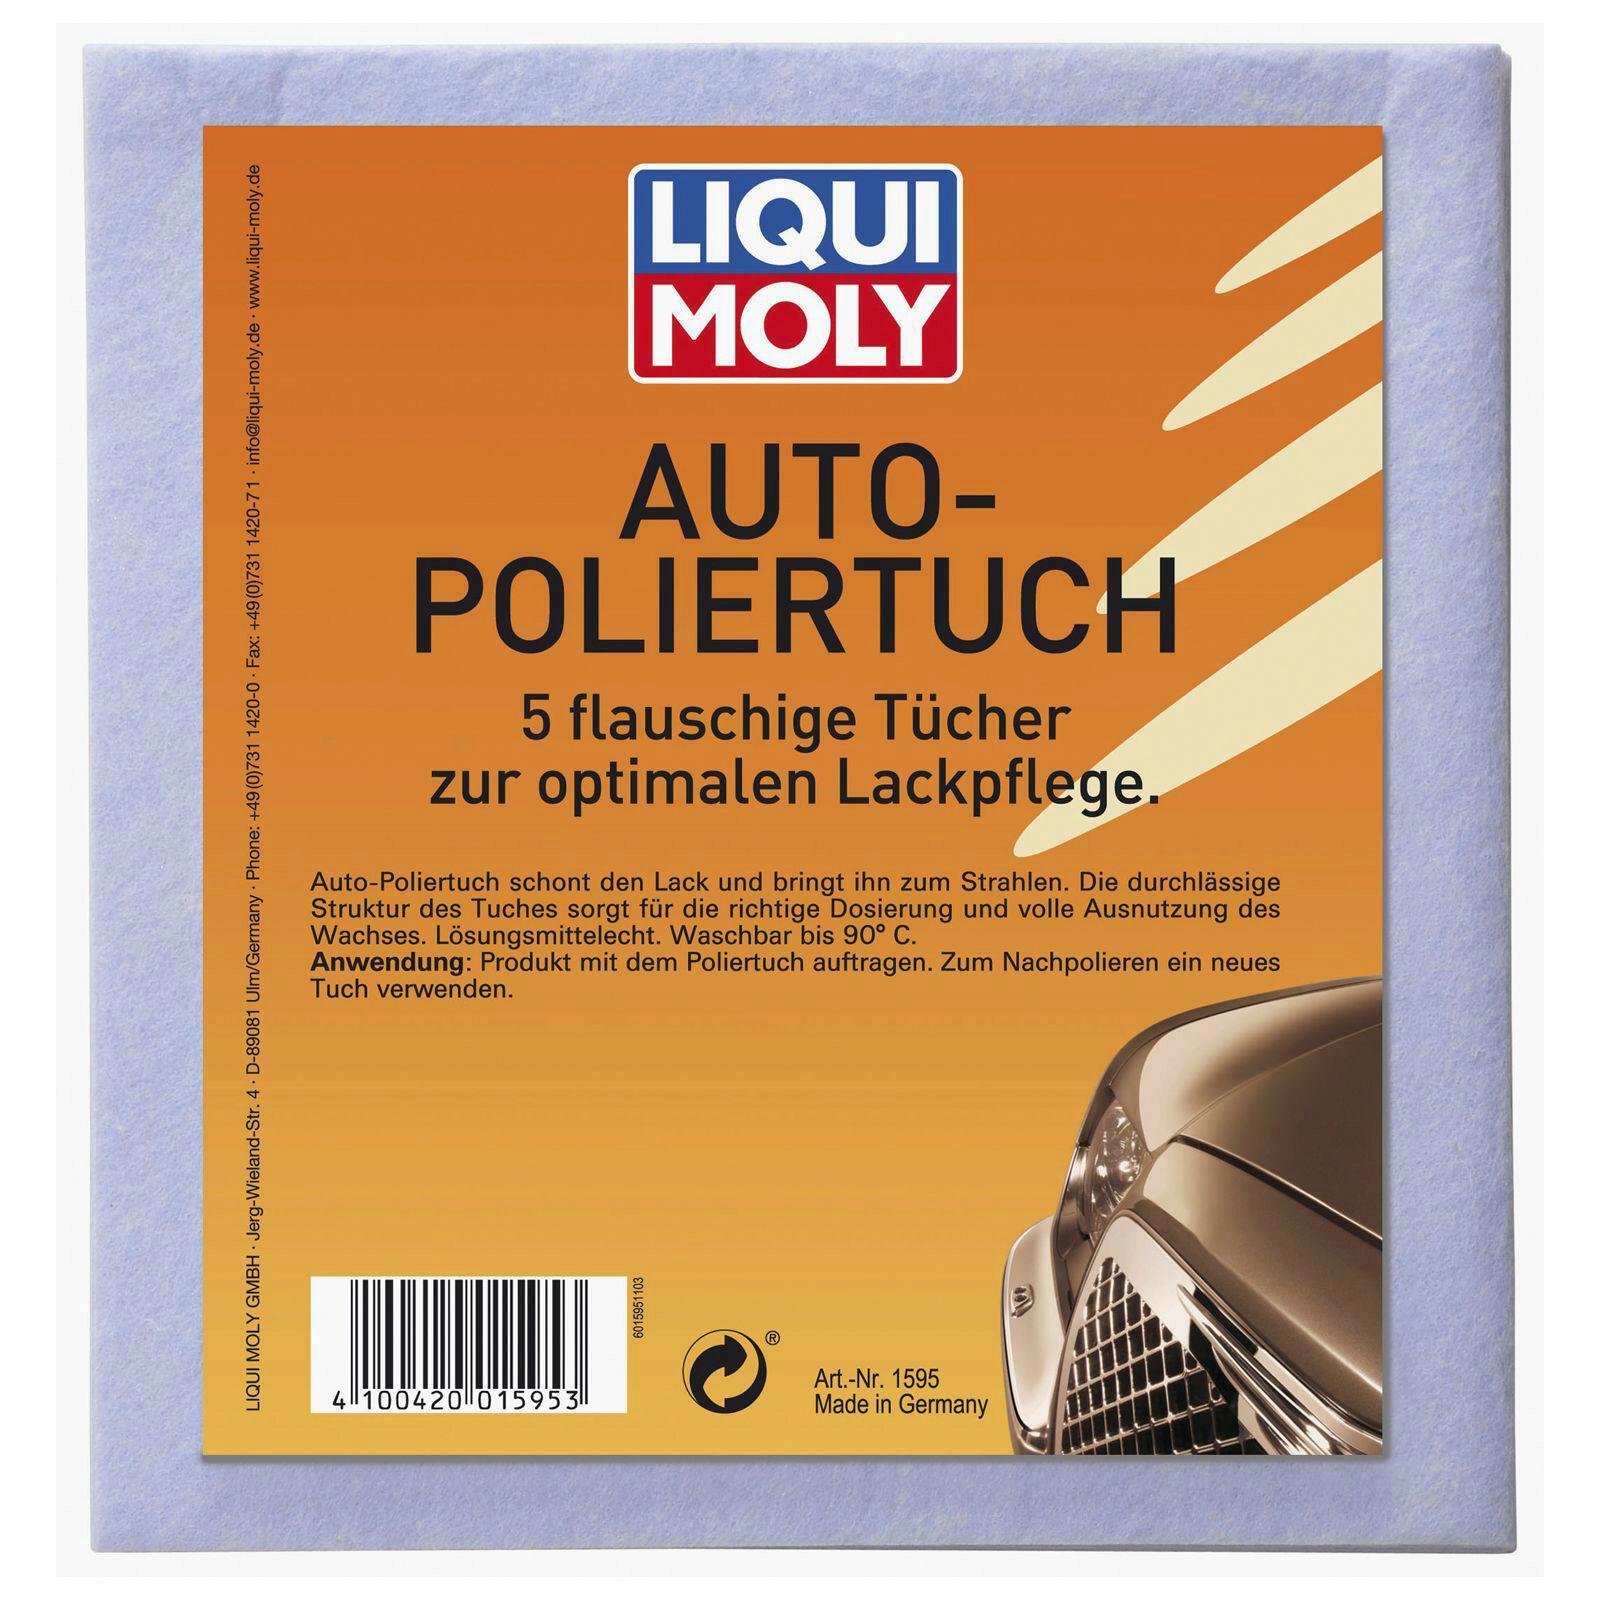 Liqui Moly Auto-Poliertuch